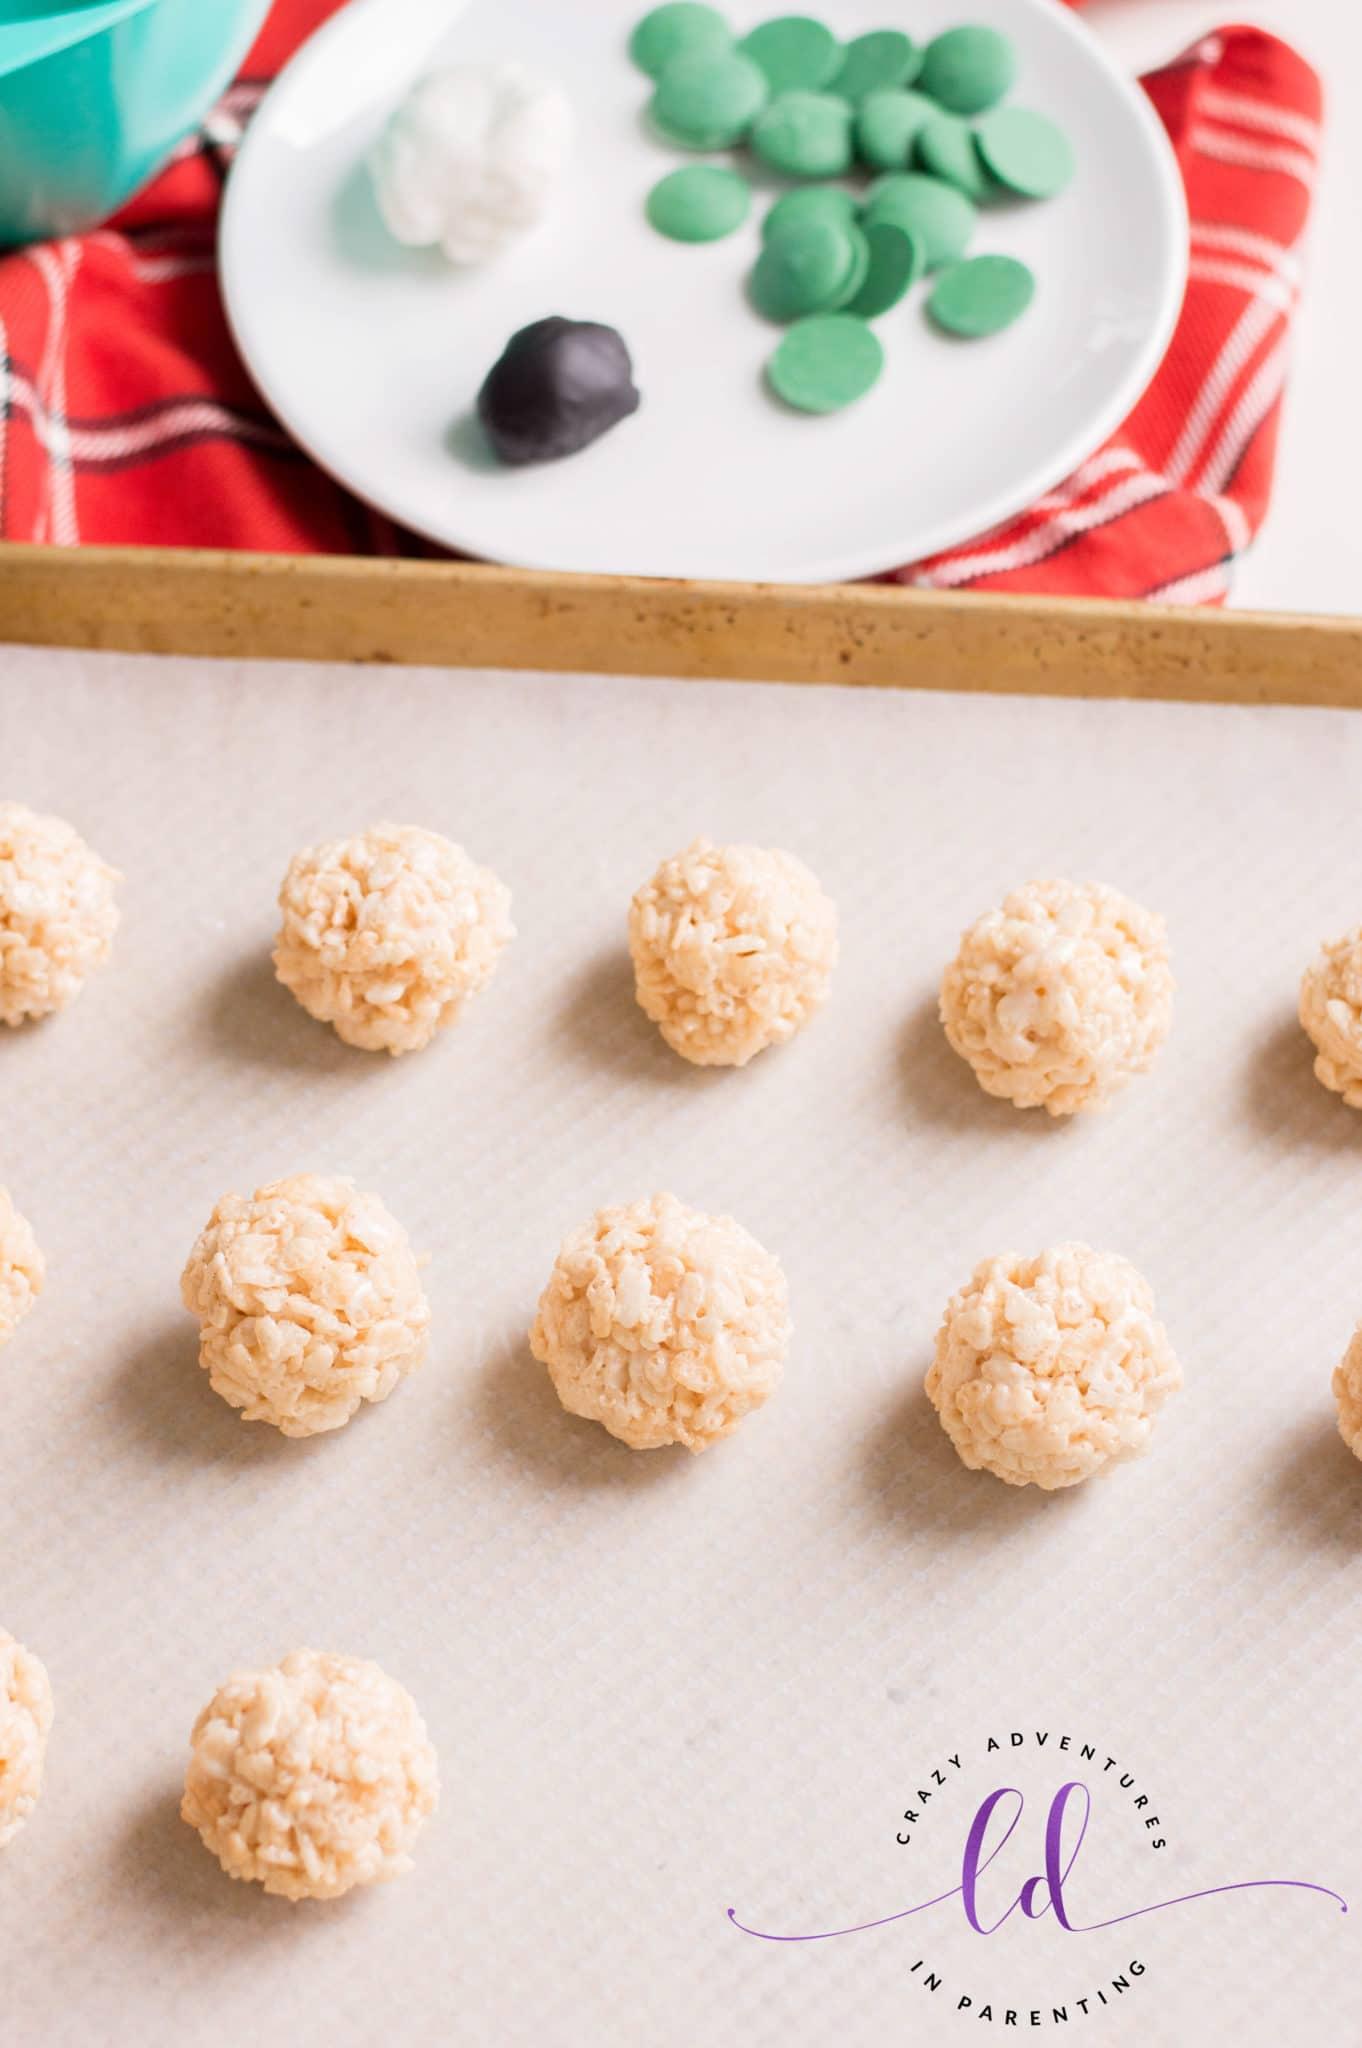 Roll into Balls to Make Halloween Eyeballs Rice Krispies Treats